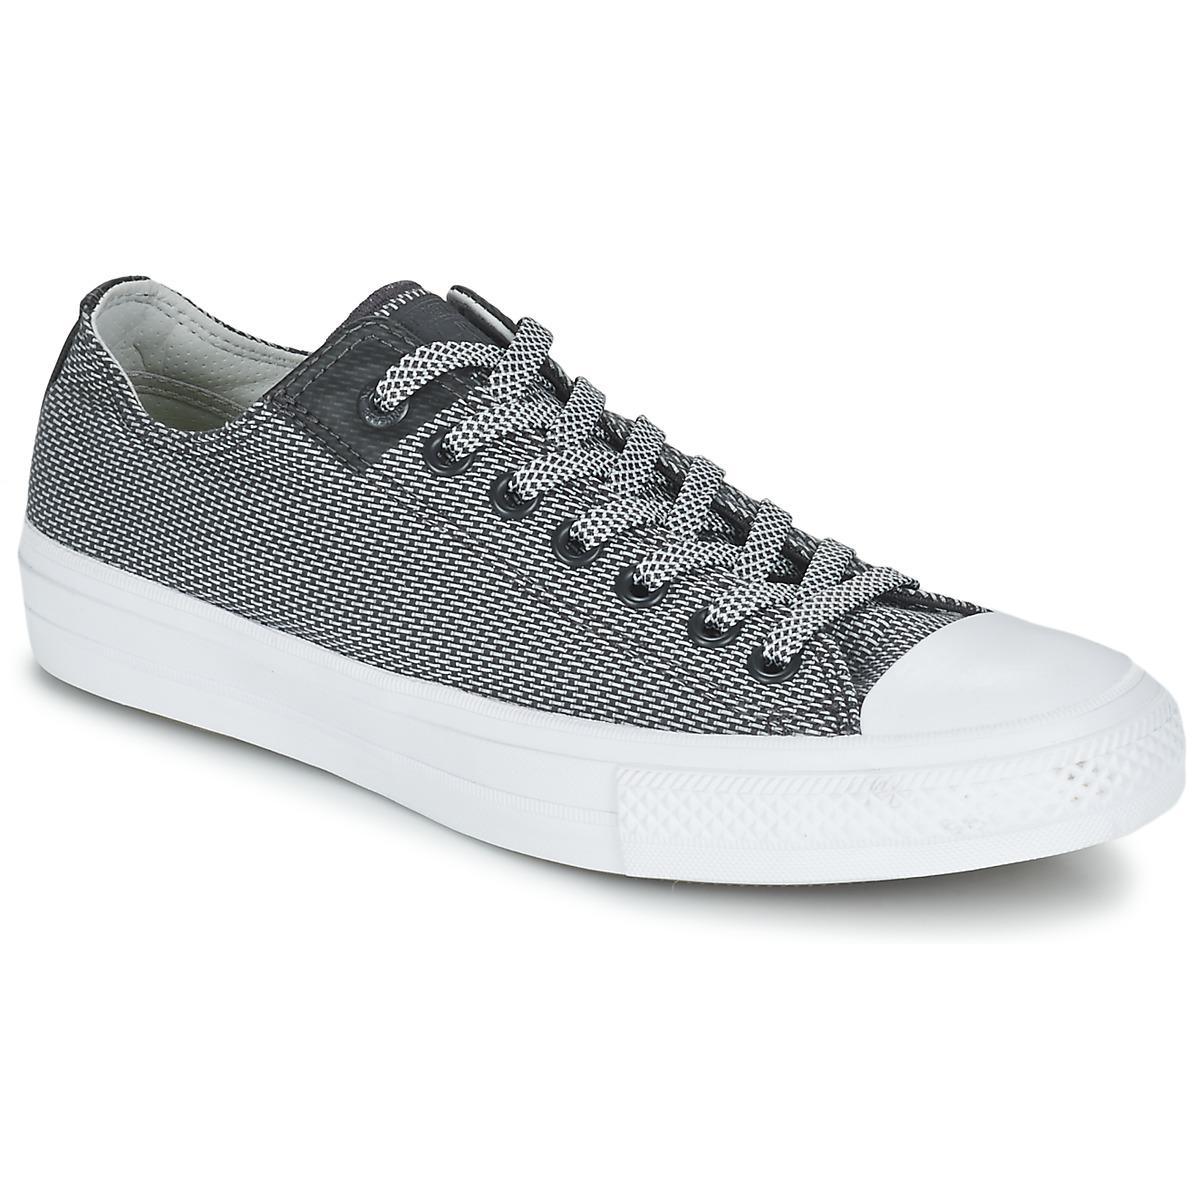 91e7f3acf9dd Converse Chuck Taylor All Star Ii Basketweave Fuse Ox Men s Shoes ...